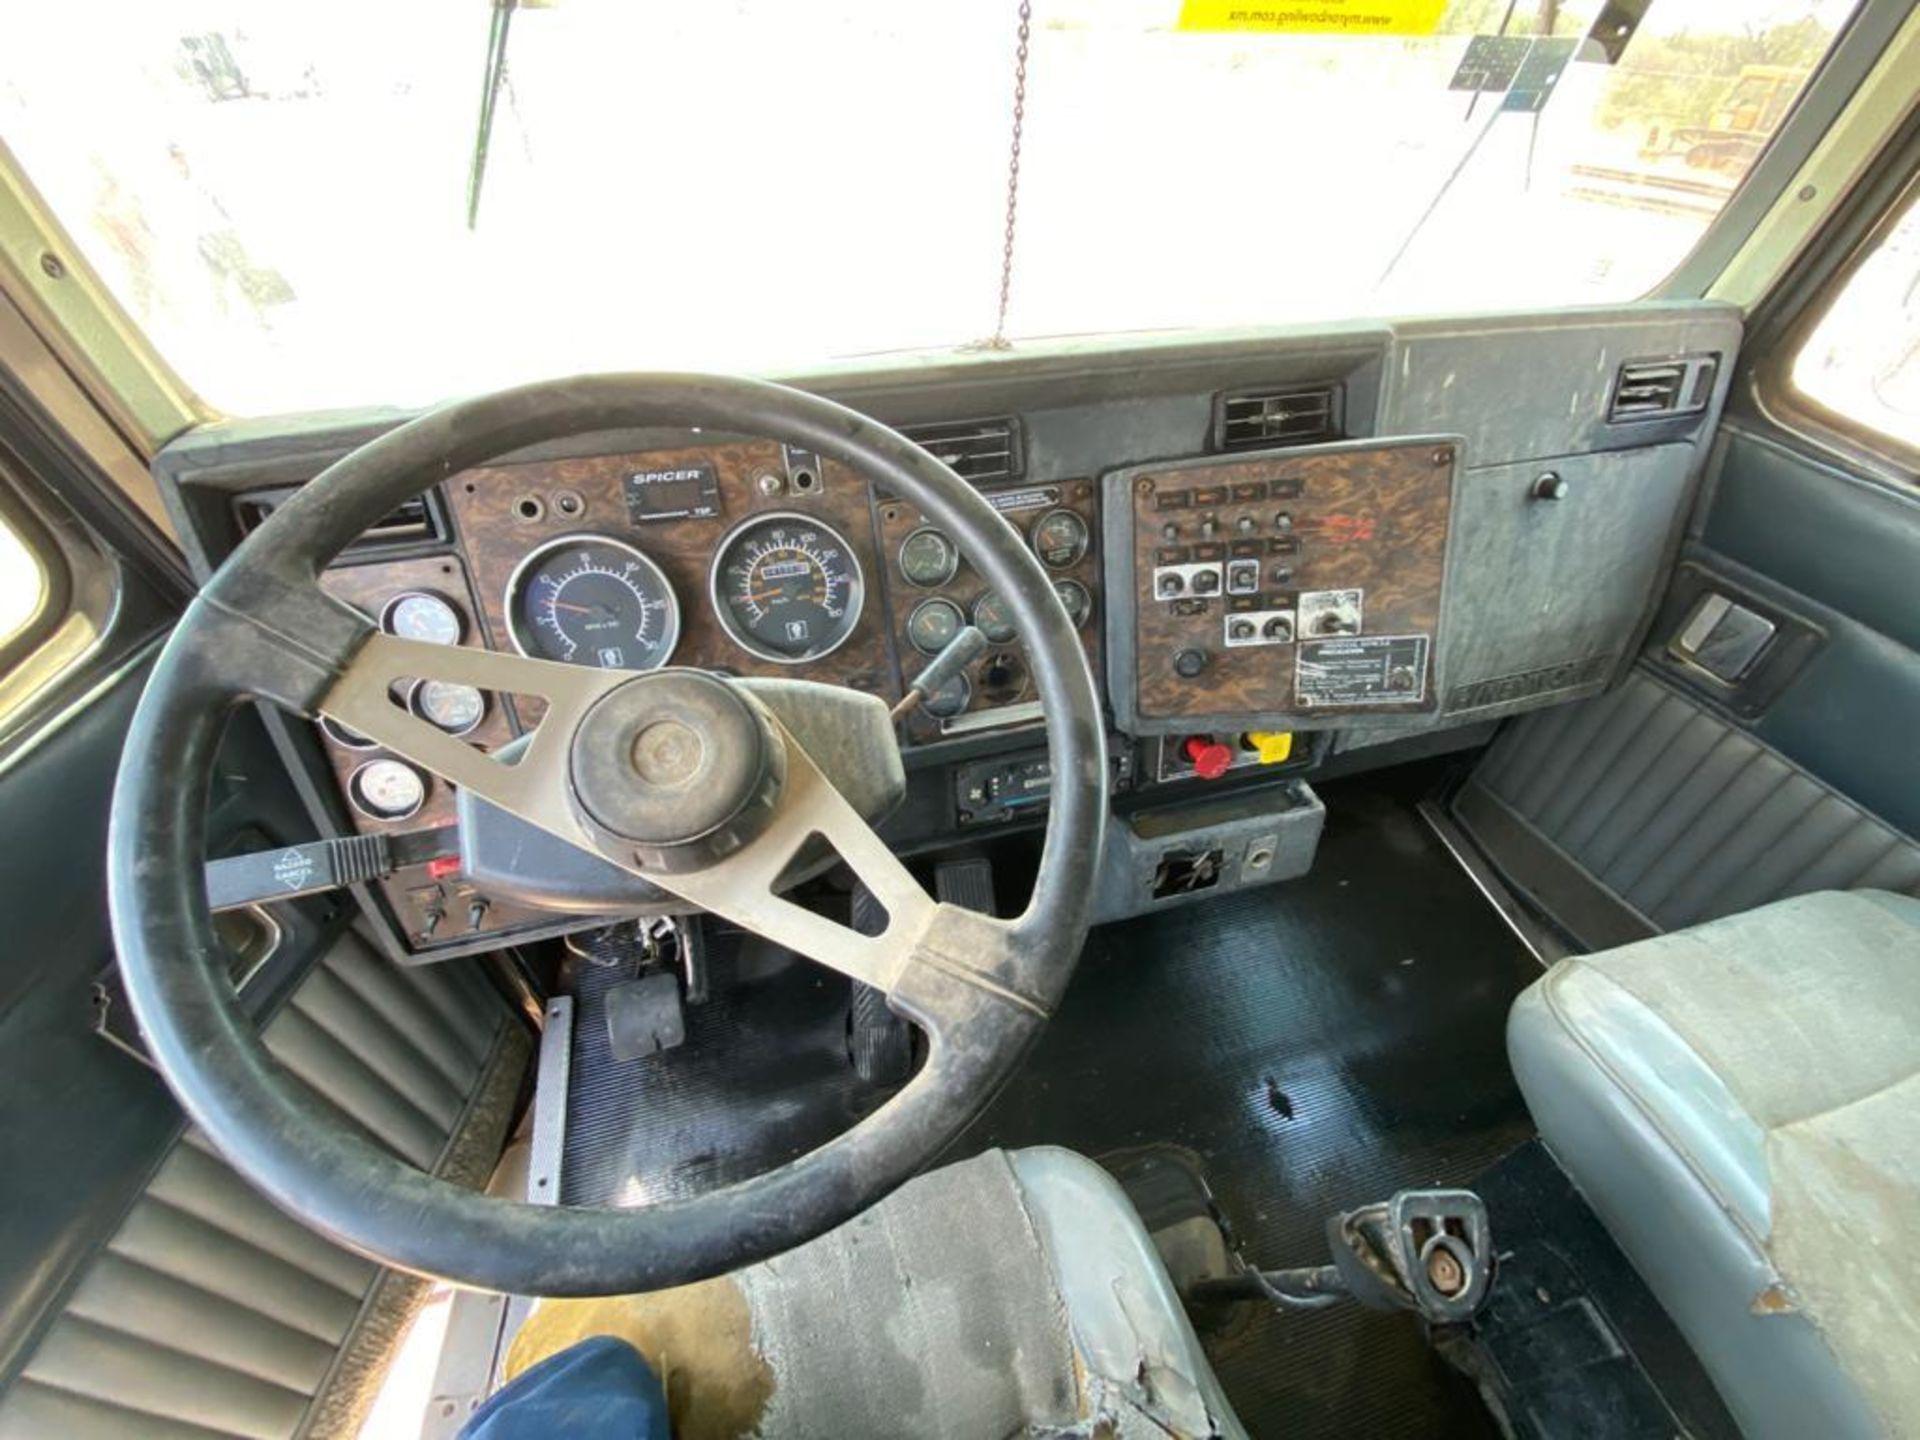 1998 Kenworth 5000 Gallon, standard transmission of 16 speeds - Image 34 of 68